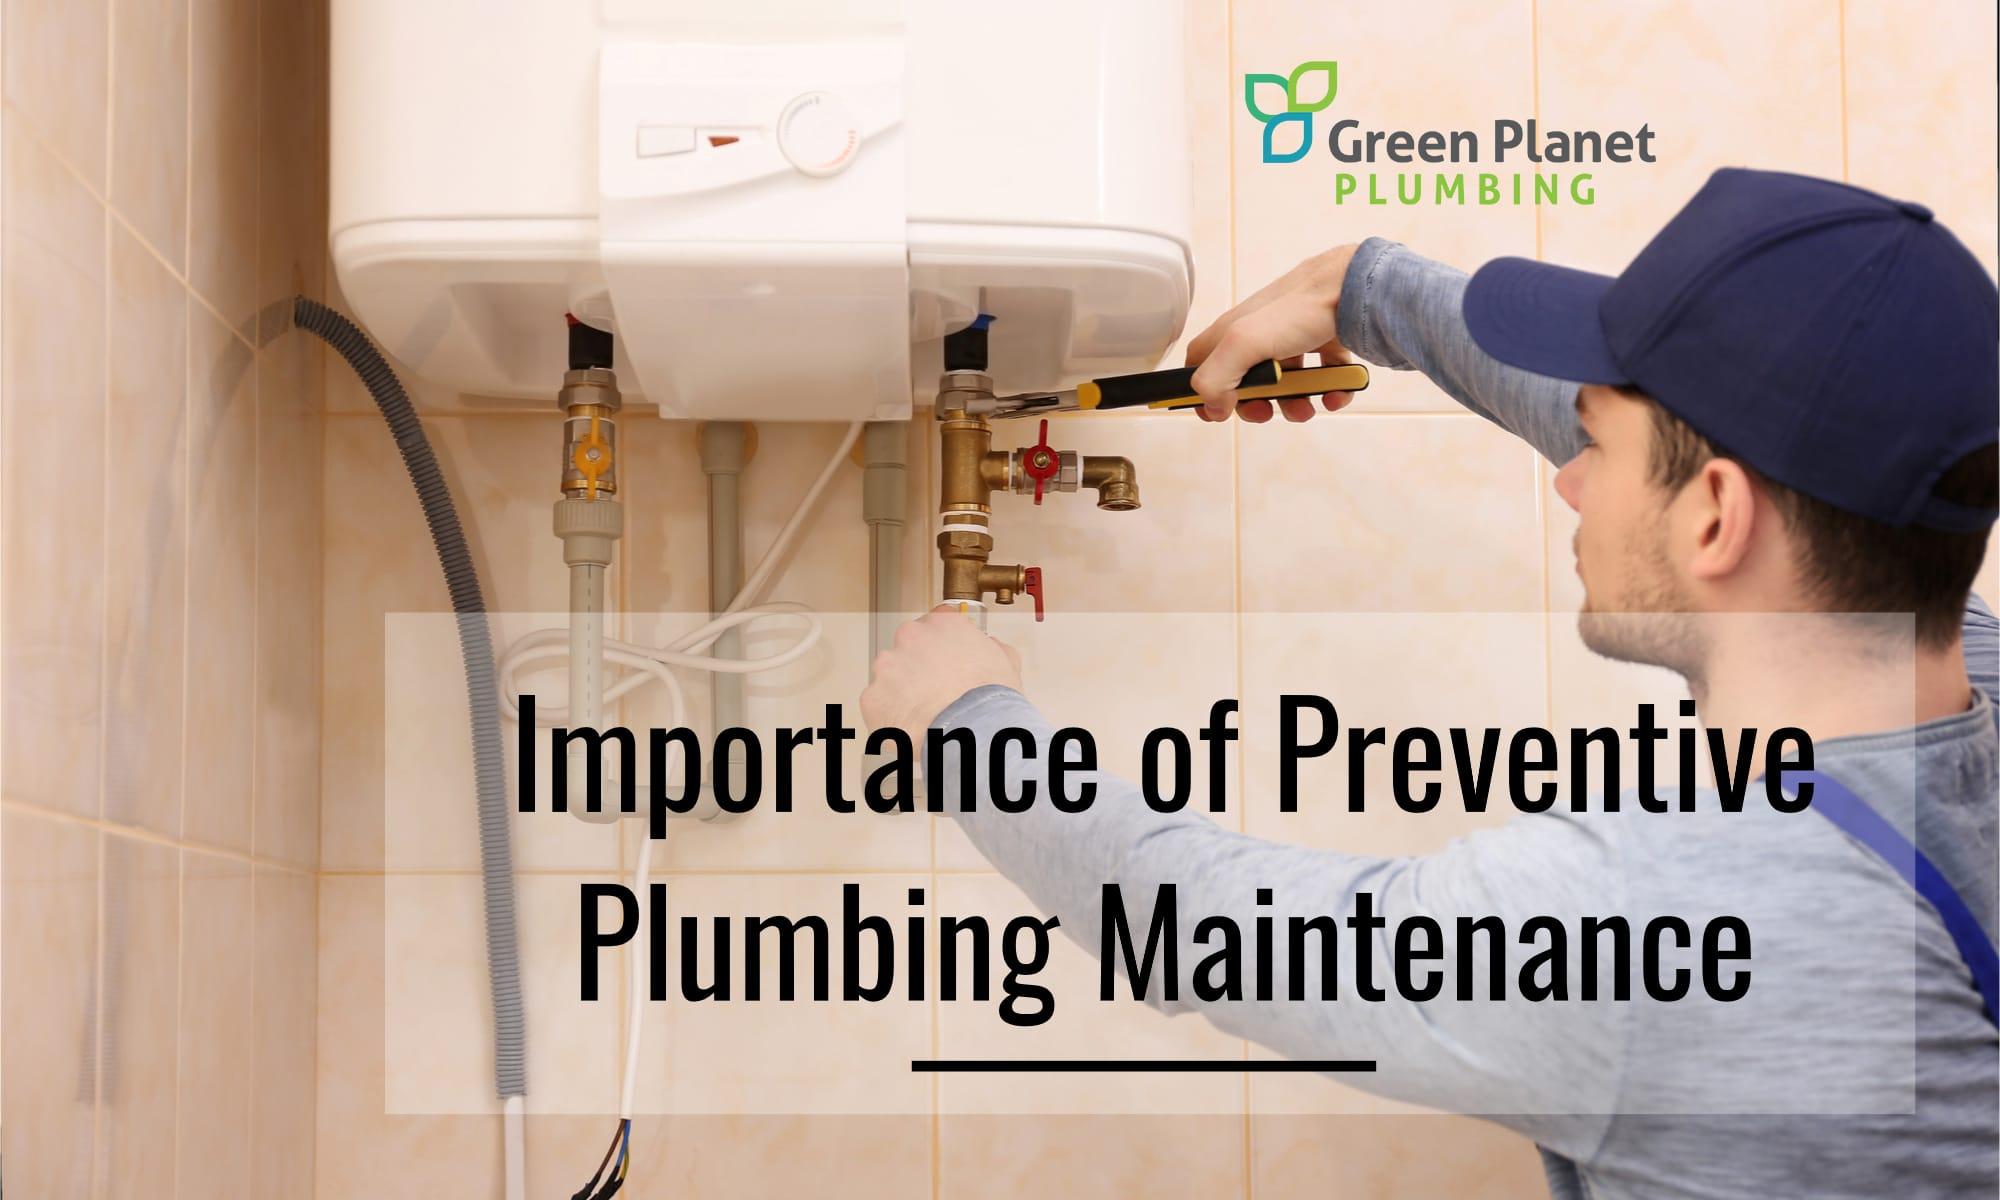 Importance of Preventive Plumbing Maintenance